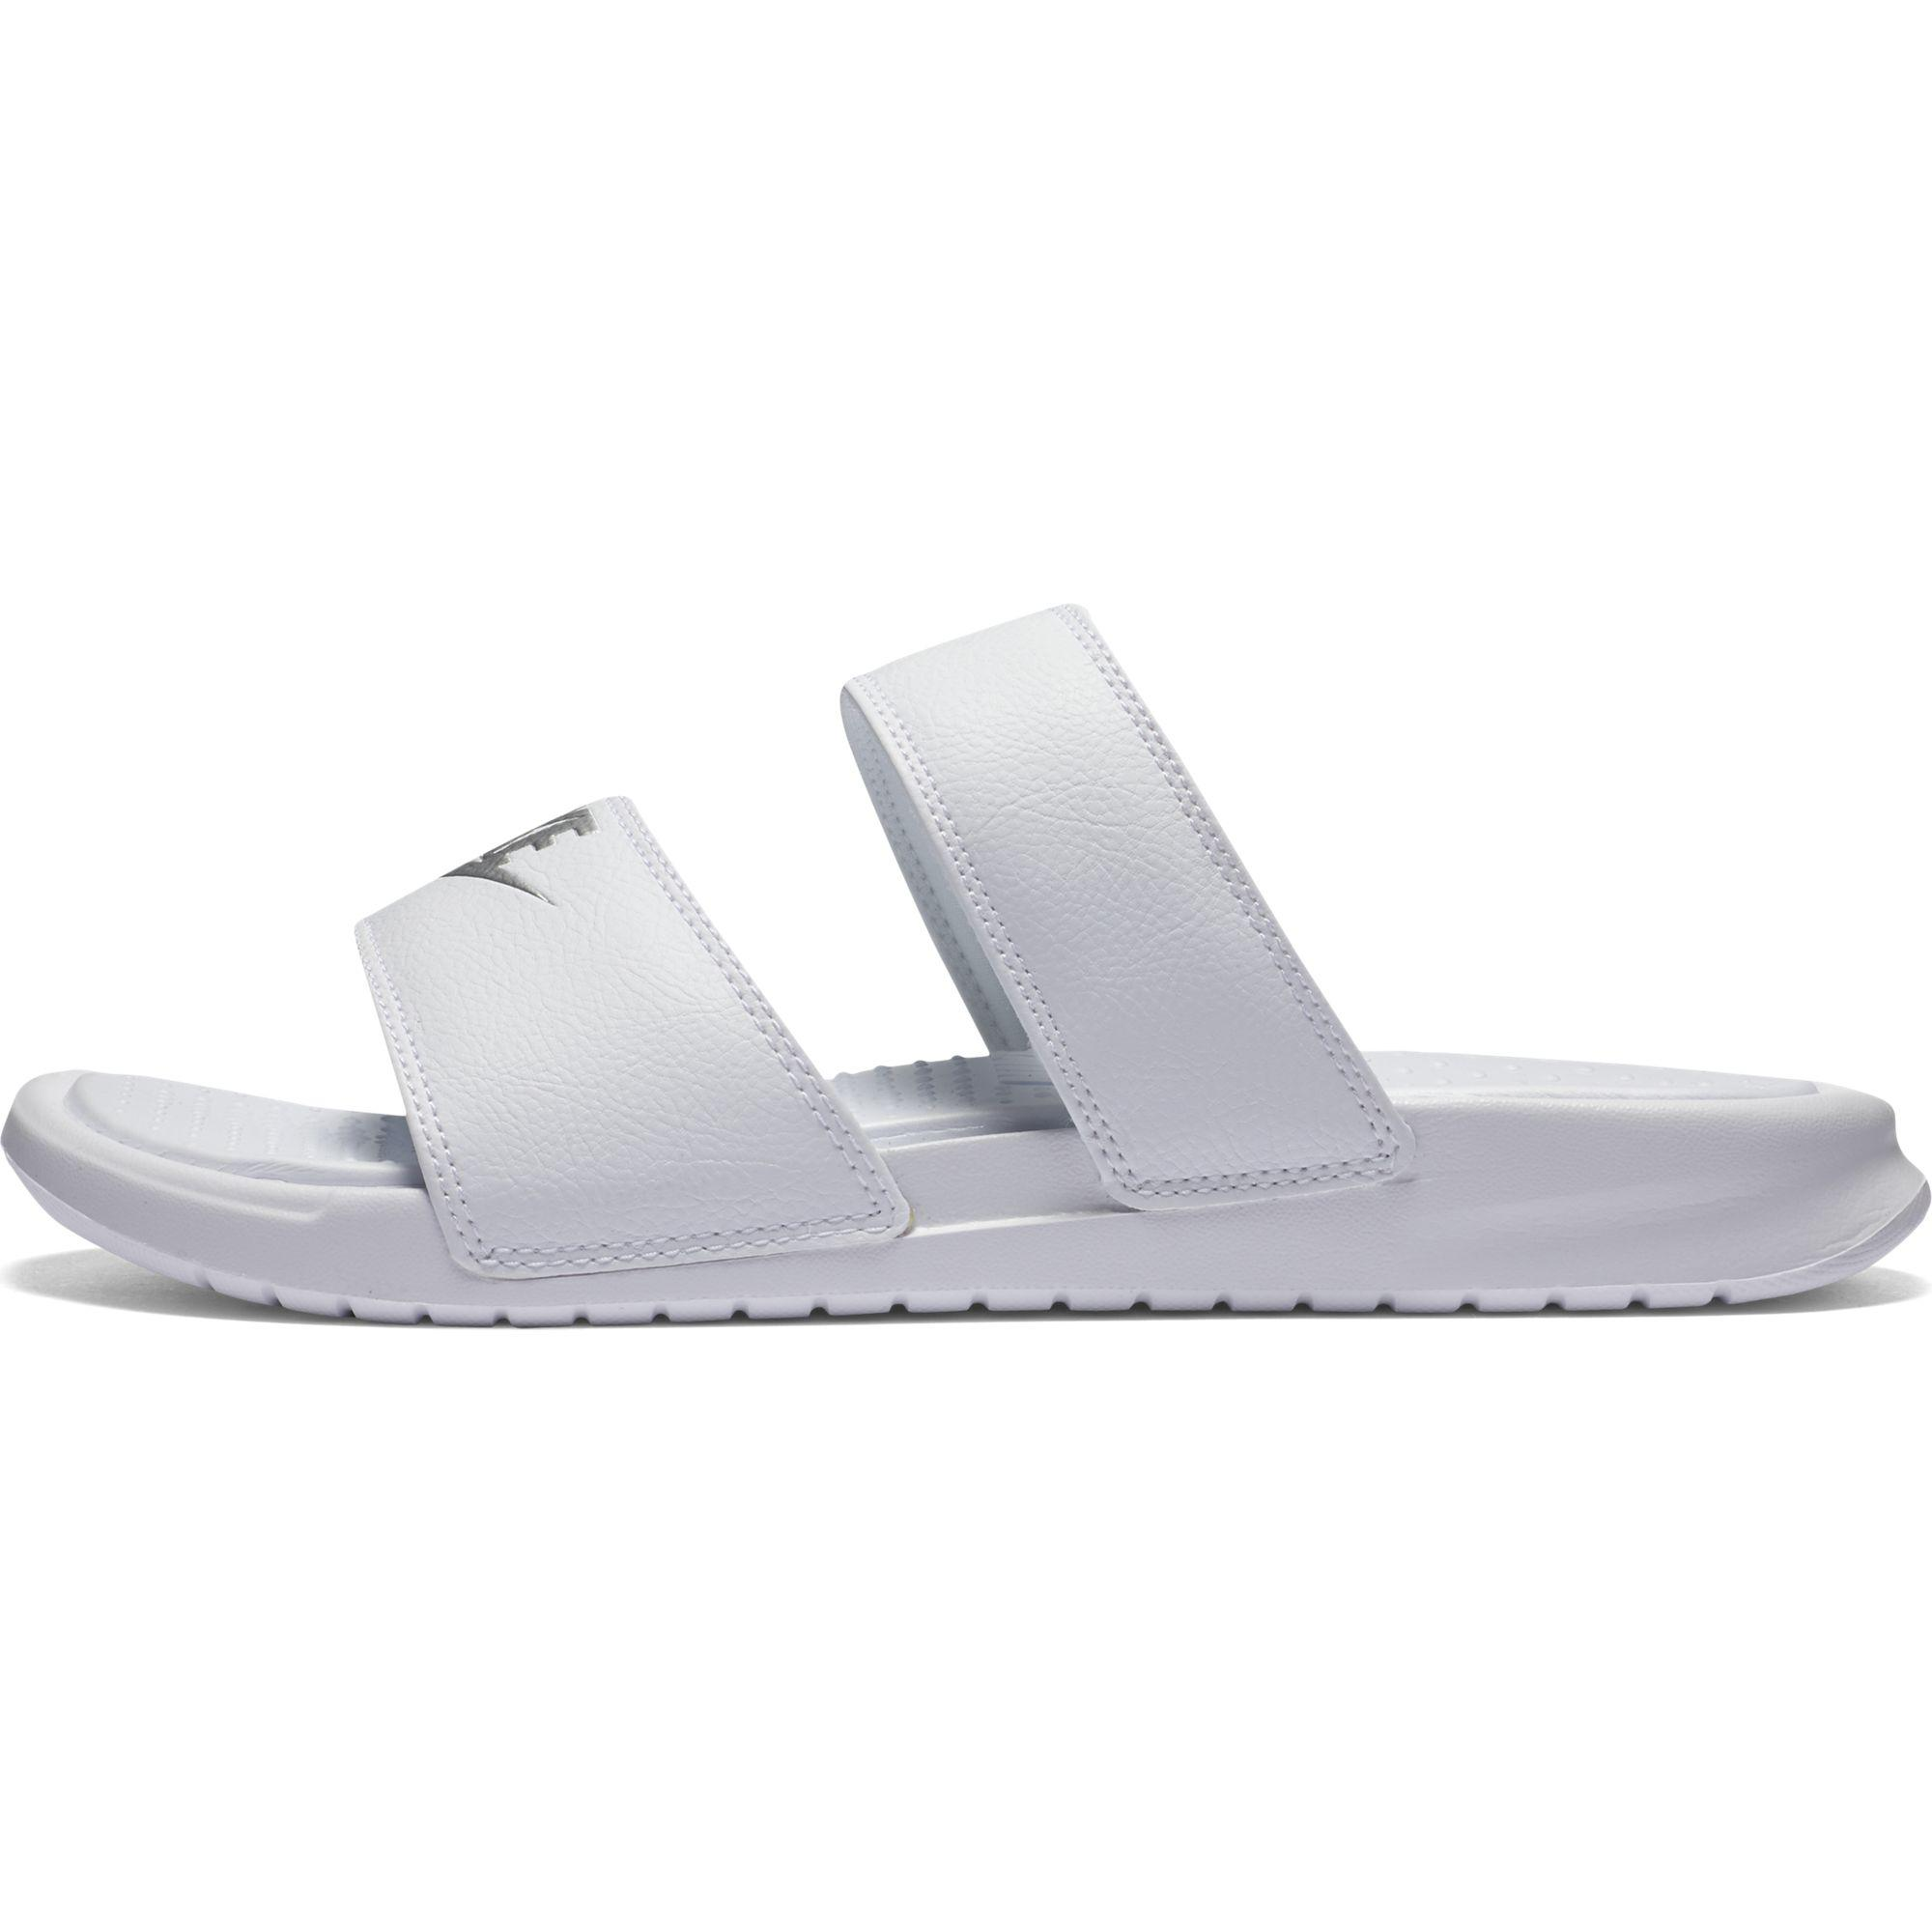 8560c3729411 Nike Womens Benassi Duo Ultra Slide Sandal - White Metallic Silver ...